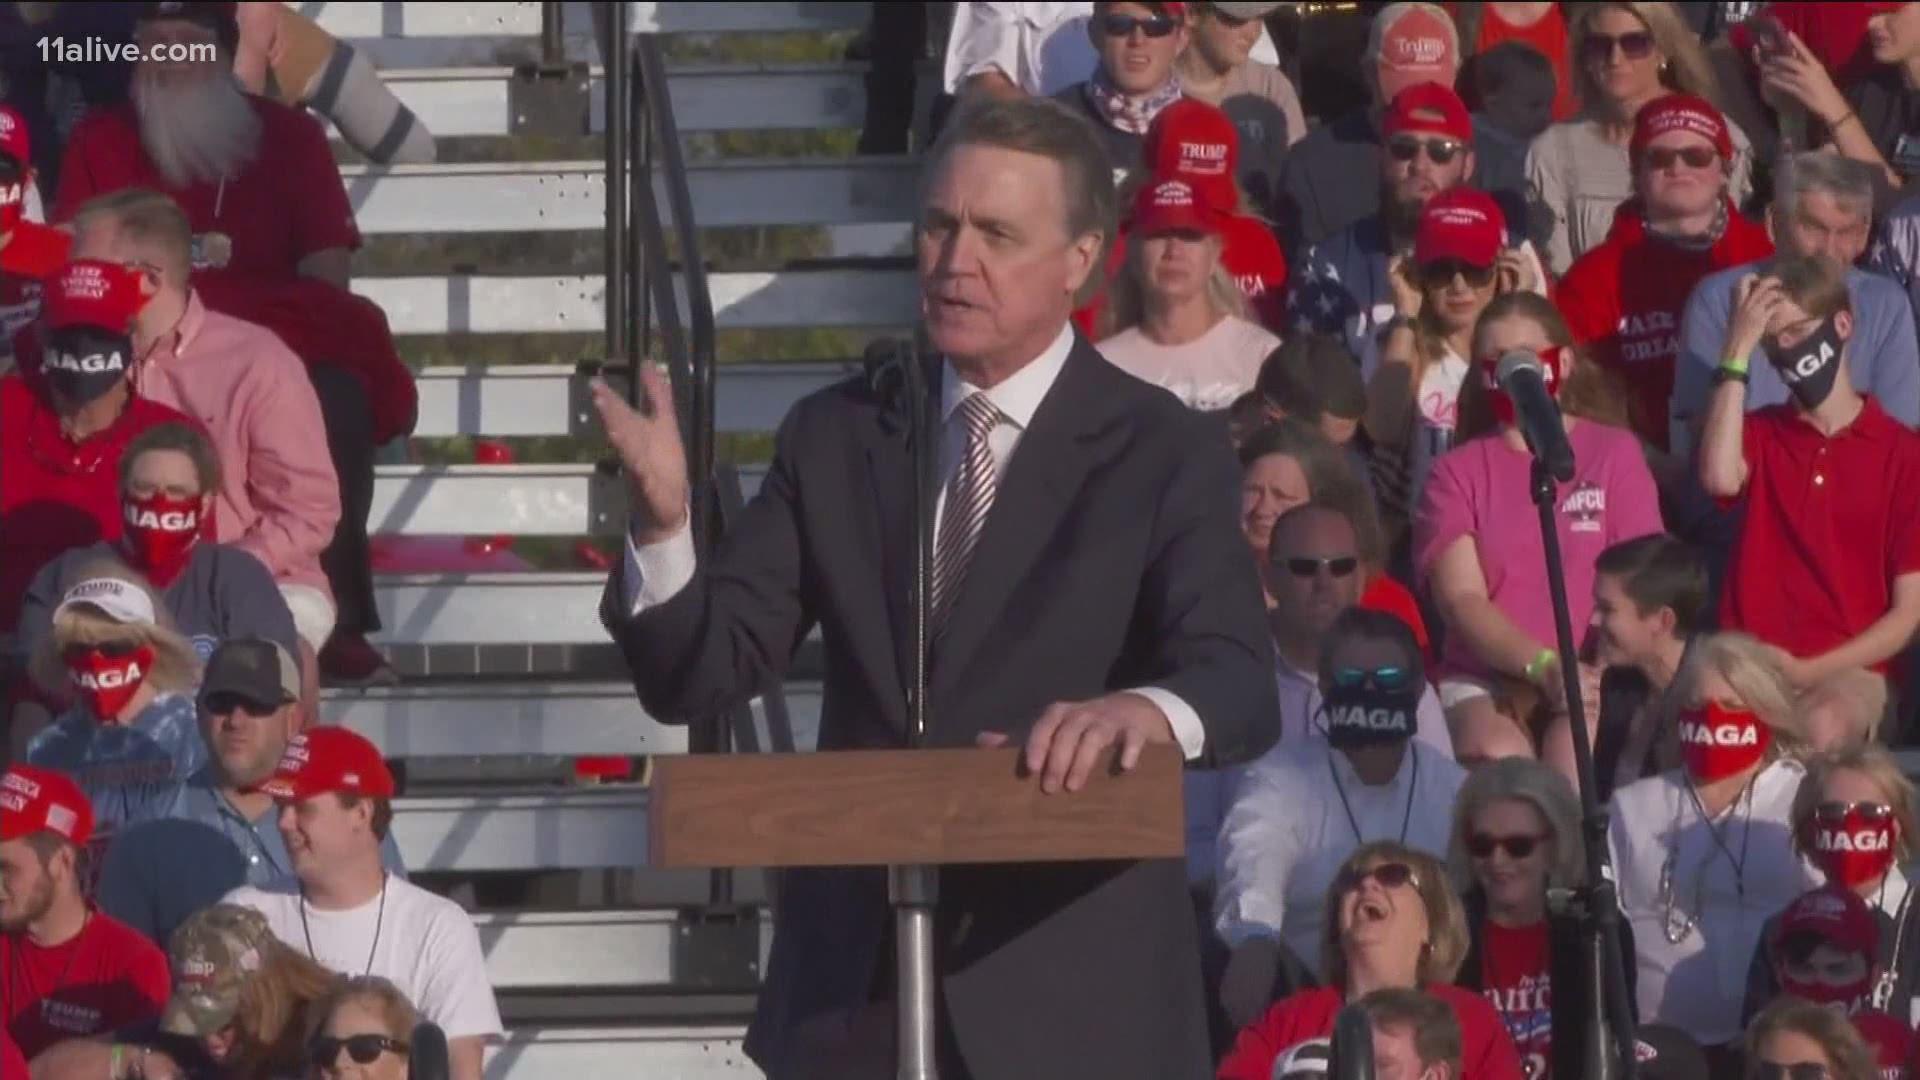 David Perdue Mispronounces Kamala Harris Name At Trump Rally Abc10 Com